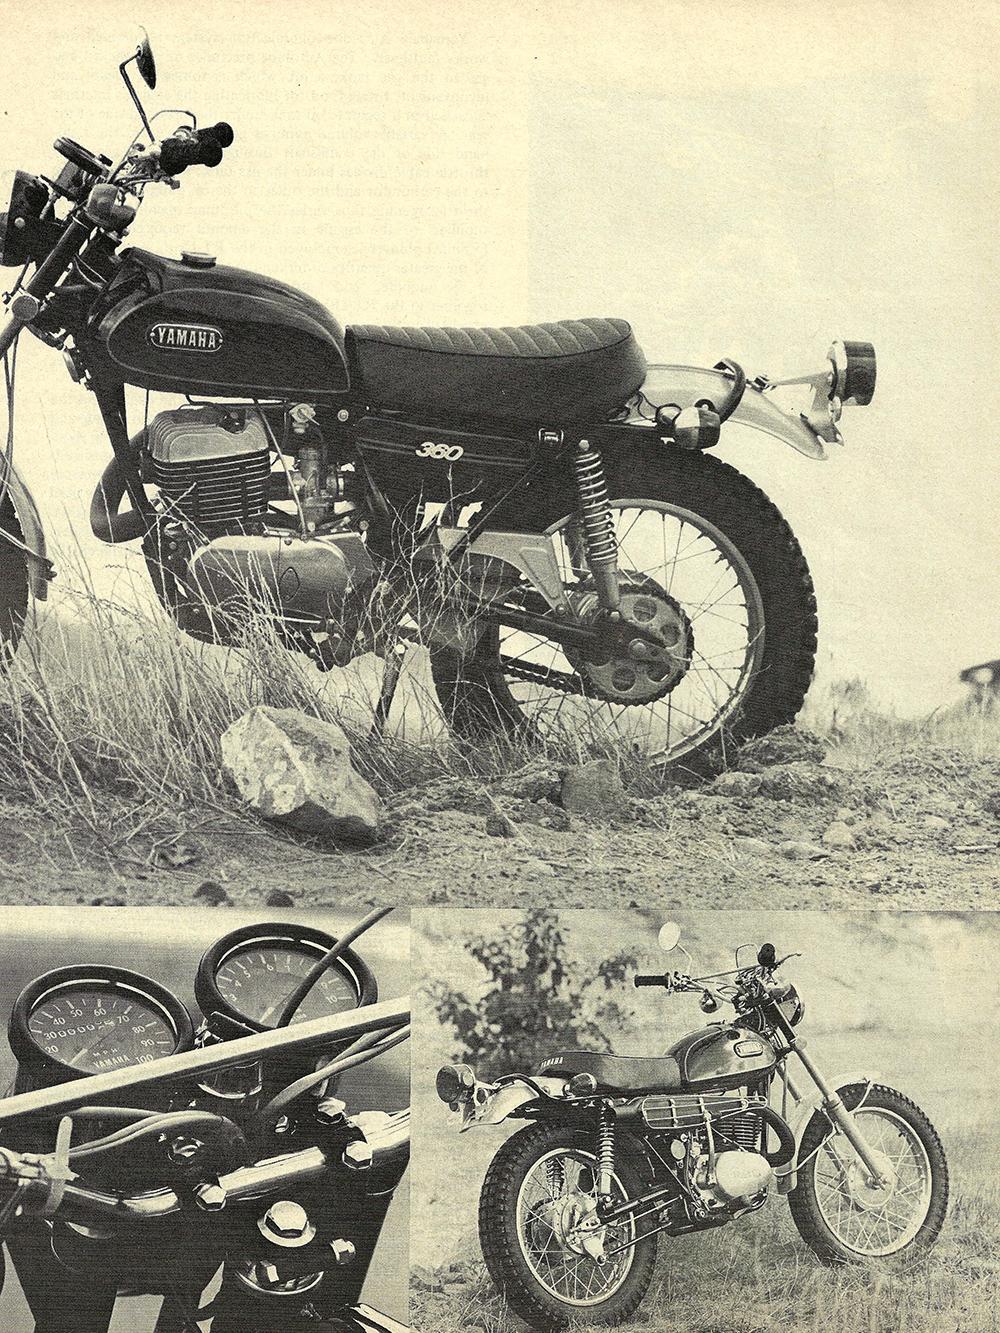 1971 Yamaha RT-1B road test 02.jpg